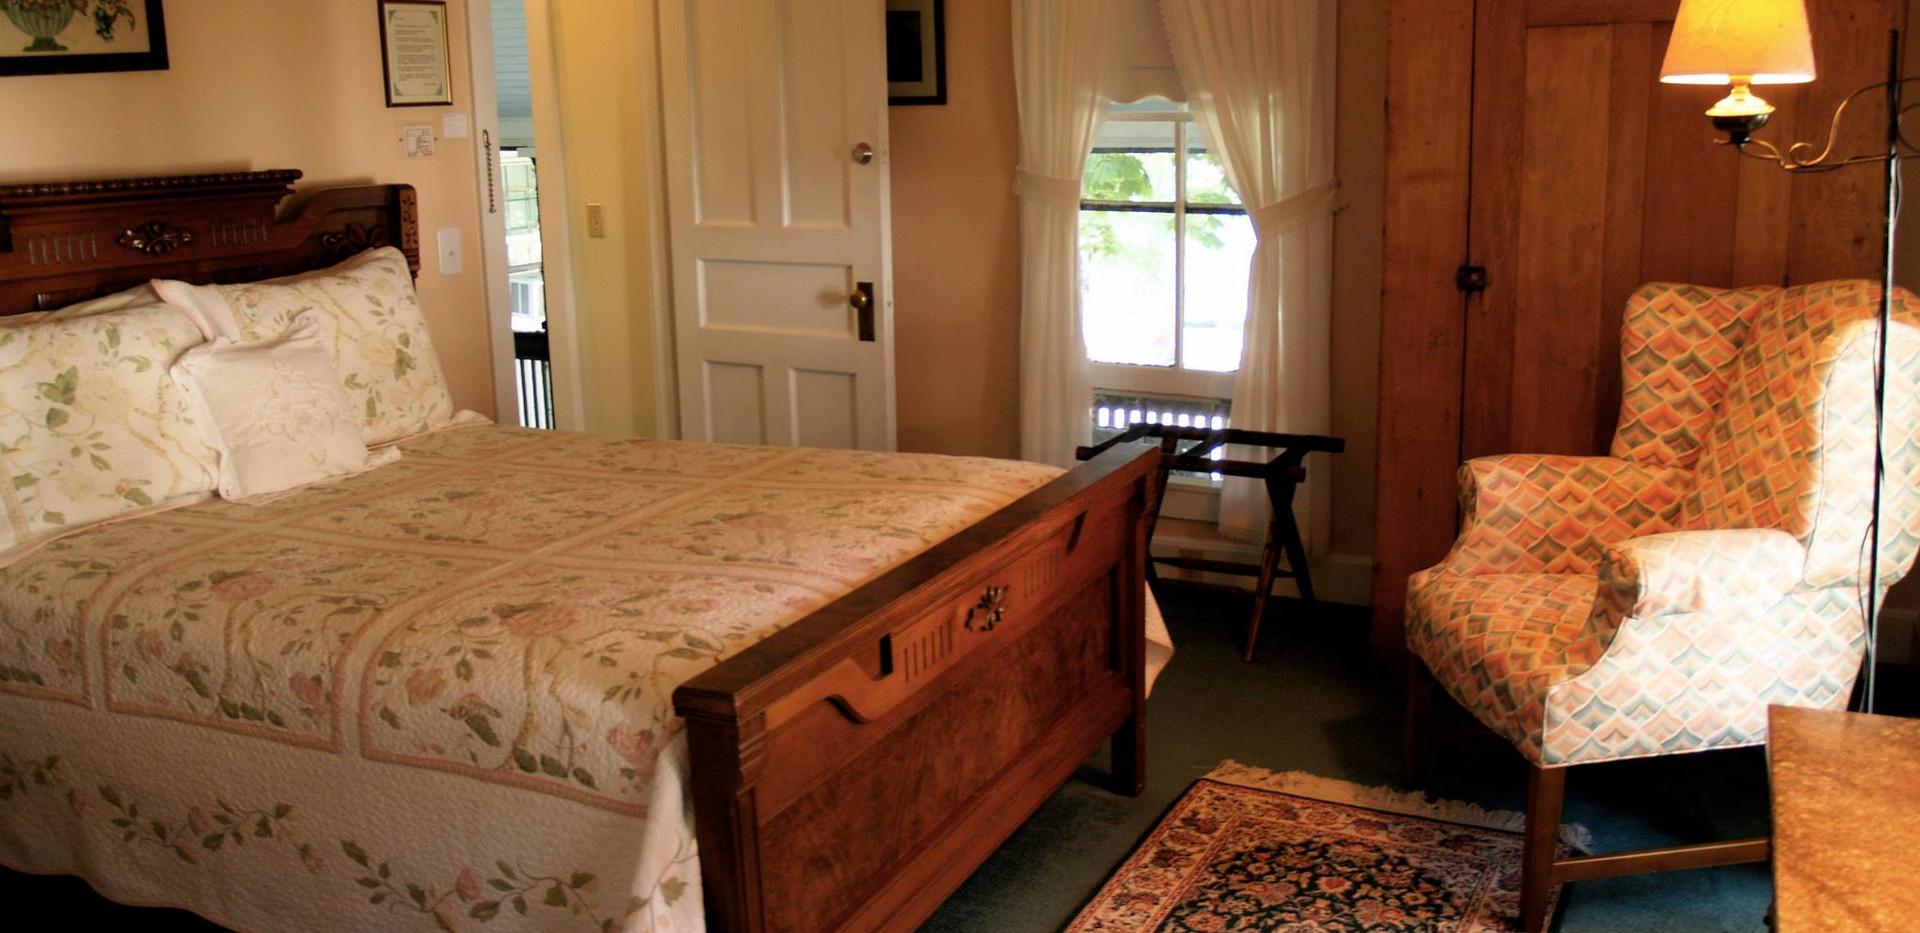 The John Jacob Astor Room